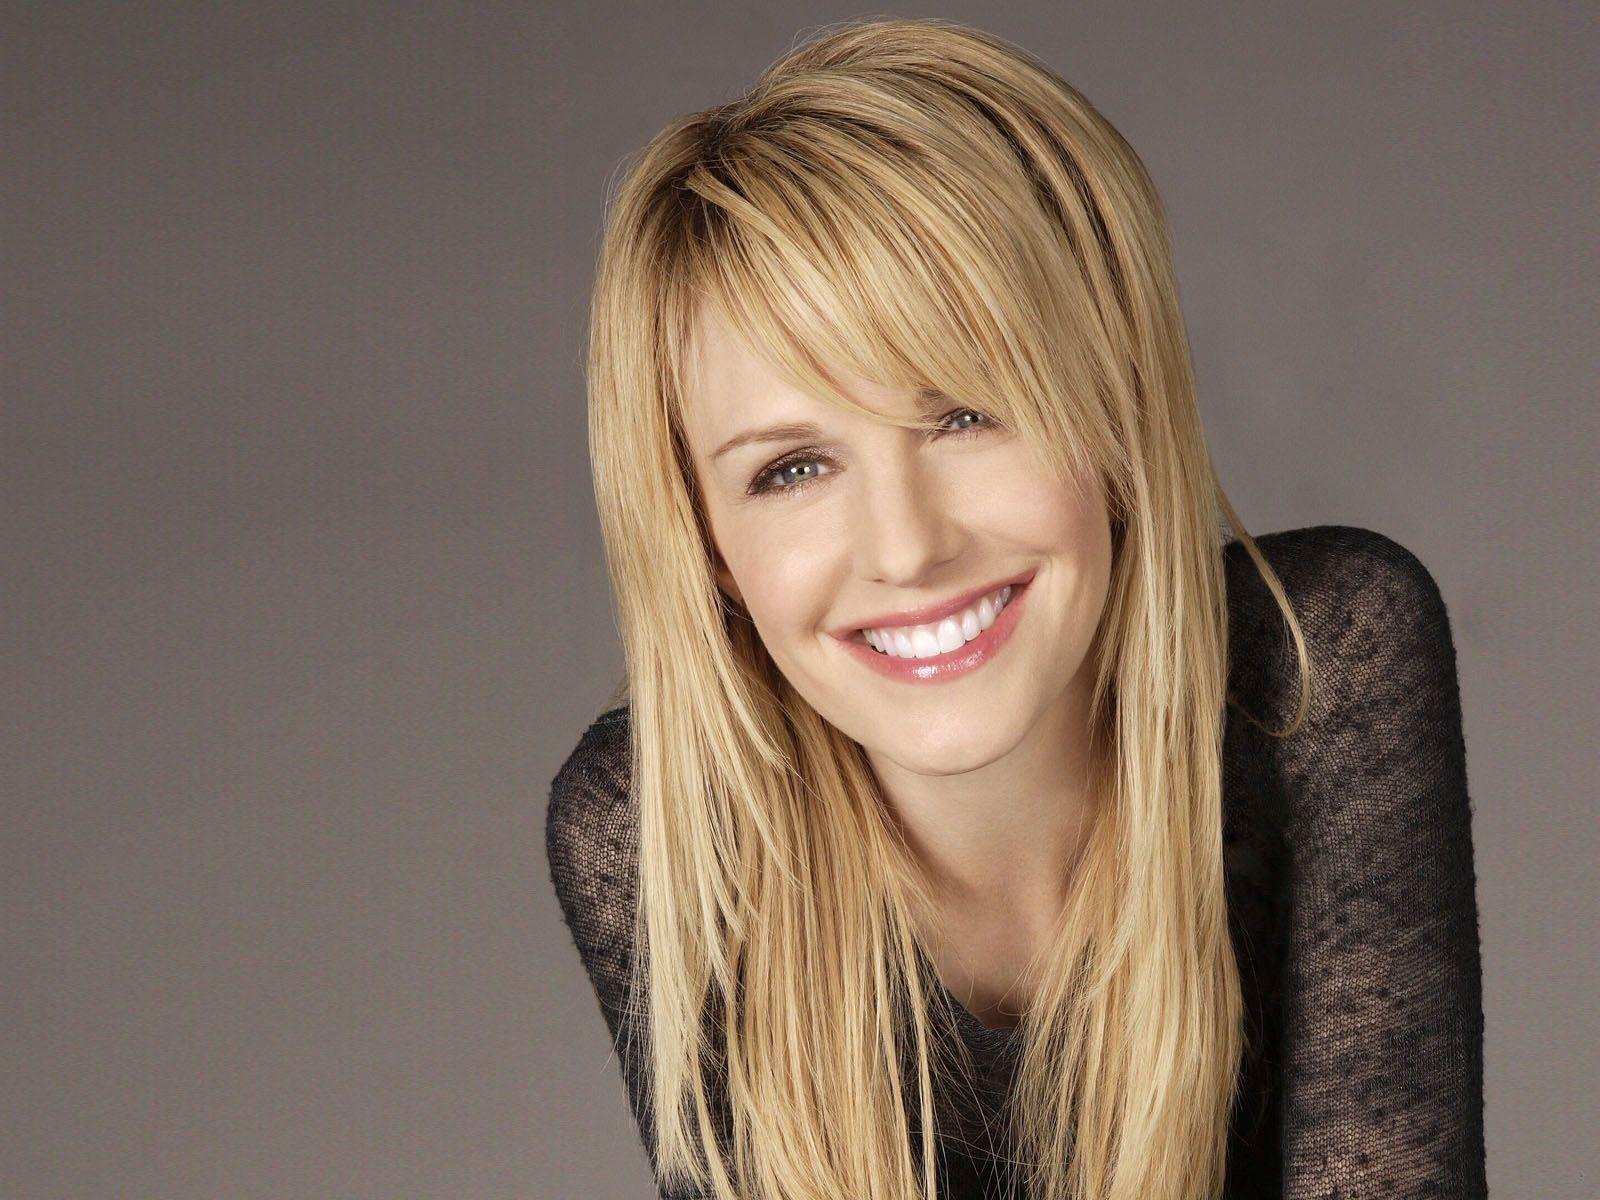 Kathryn Morris ranks among 2003s top breakouts | Kathryn